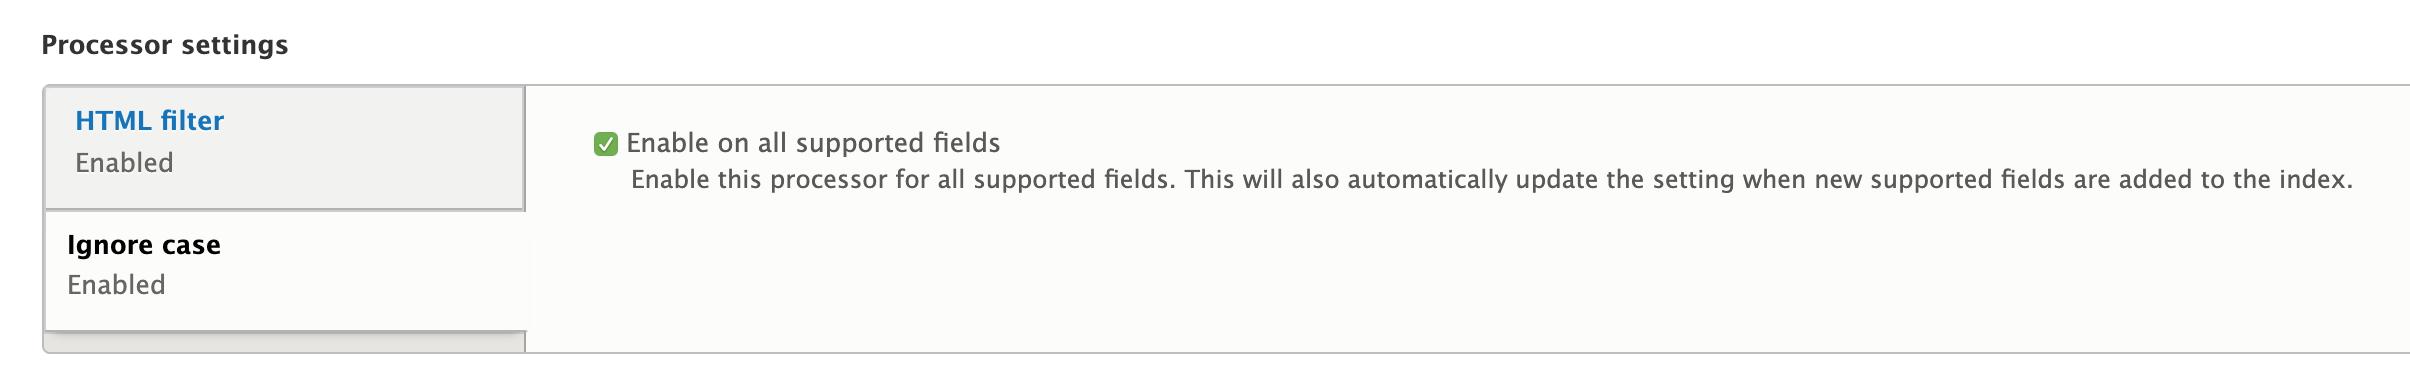 update processor settings for ignore case